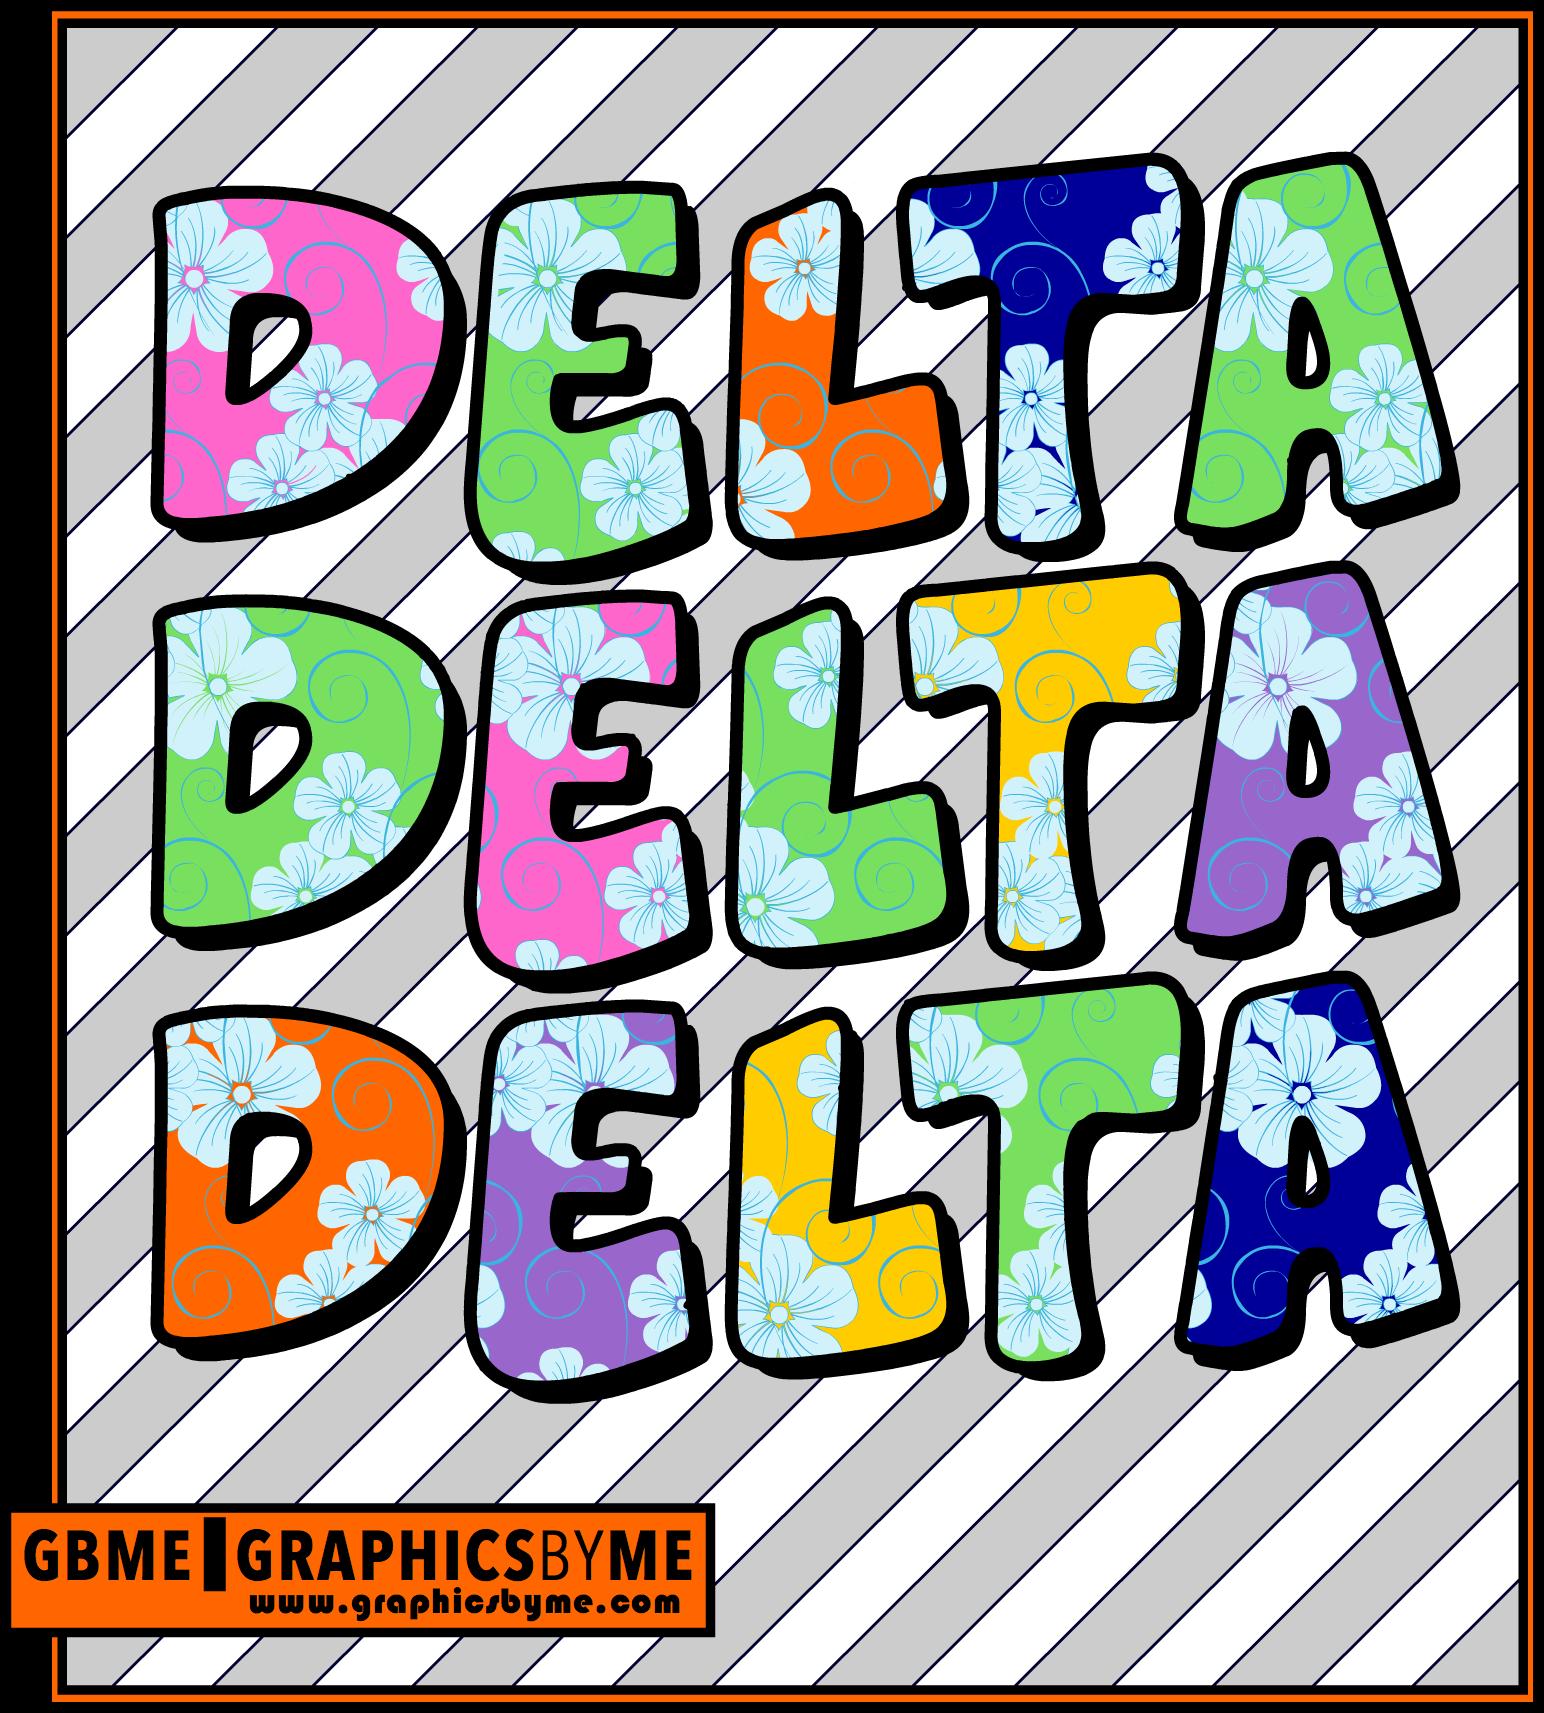 Graphics By ME Posters .... delta delta delta sororityGraphics By ME Posters .... delta delta delta sorority, #deltadeltadelta #tridelta #delta